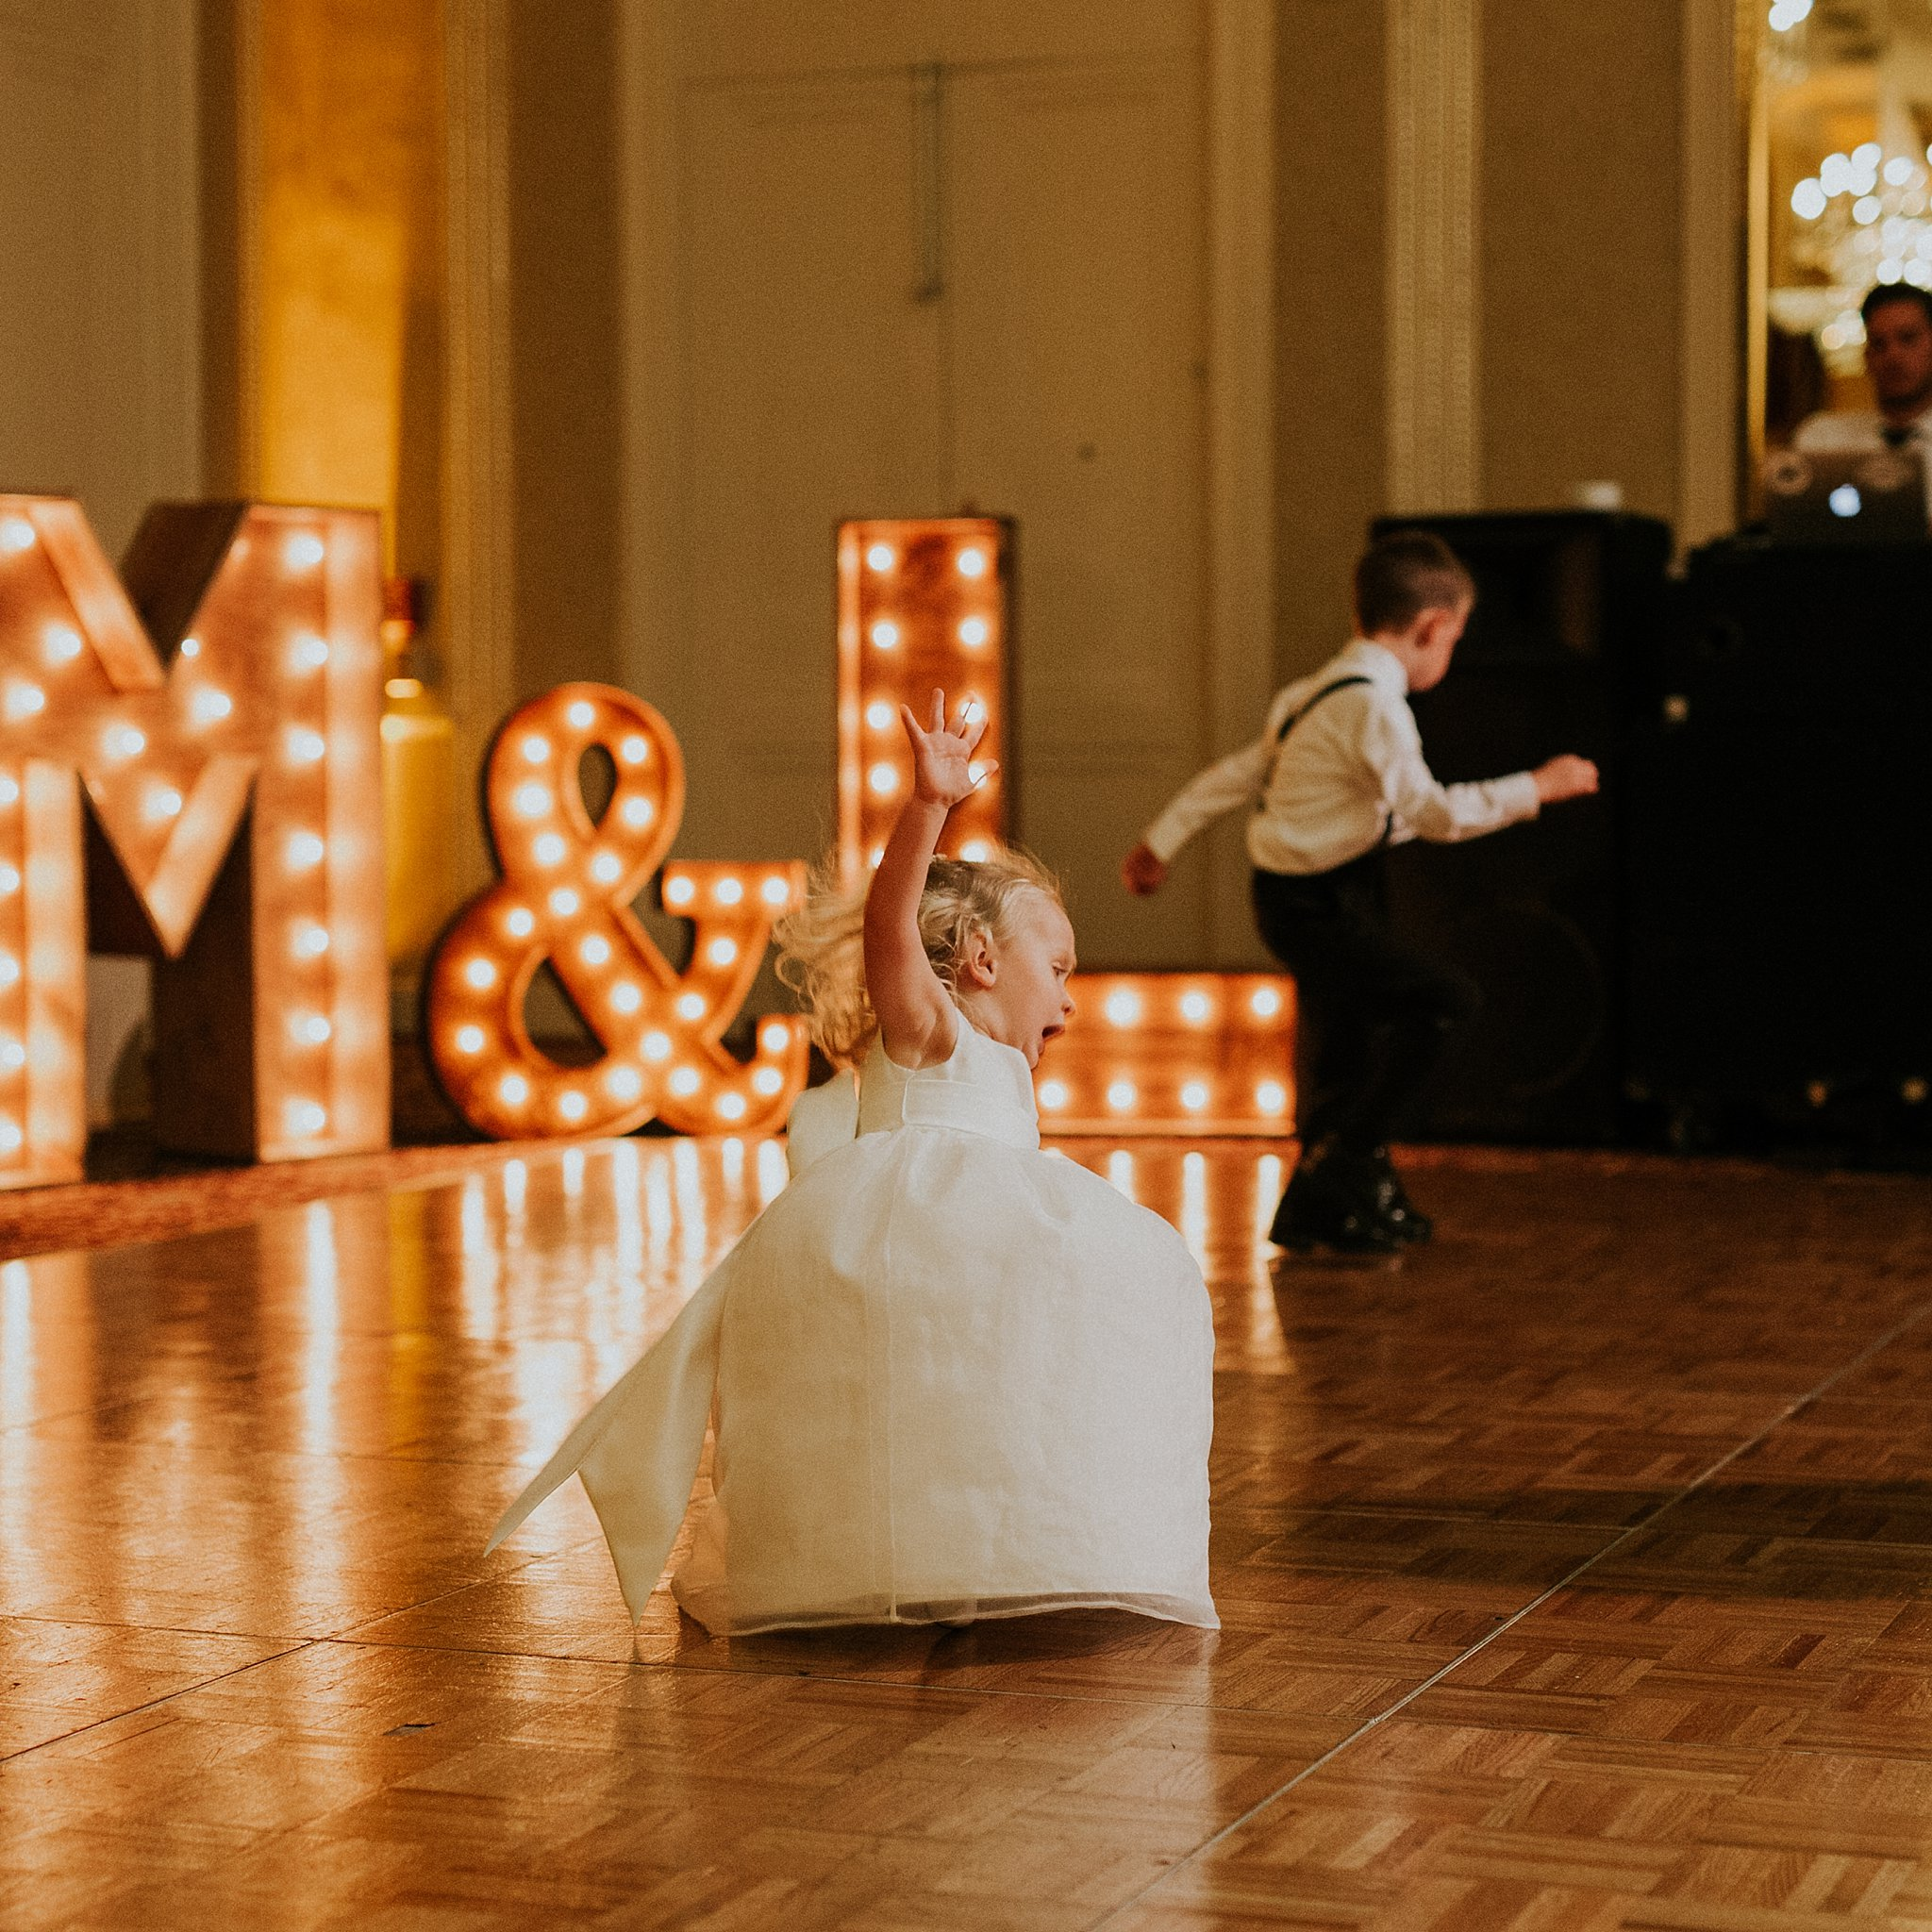 Matt-Lauren_St-Marys_Hilton-City-Center-Milwaukee-Wedding_liller-photo_0078.jpg